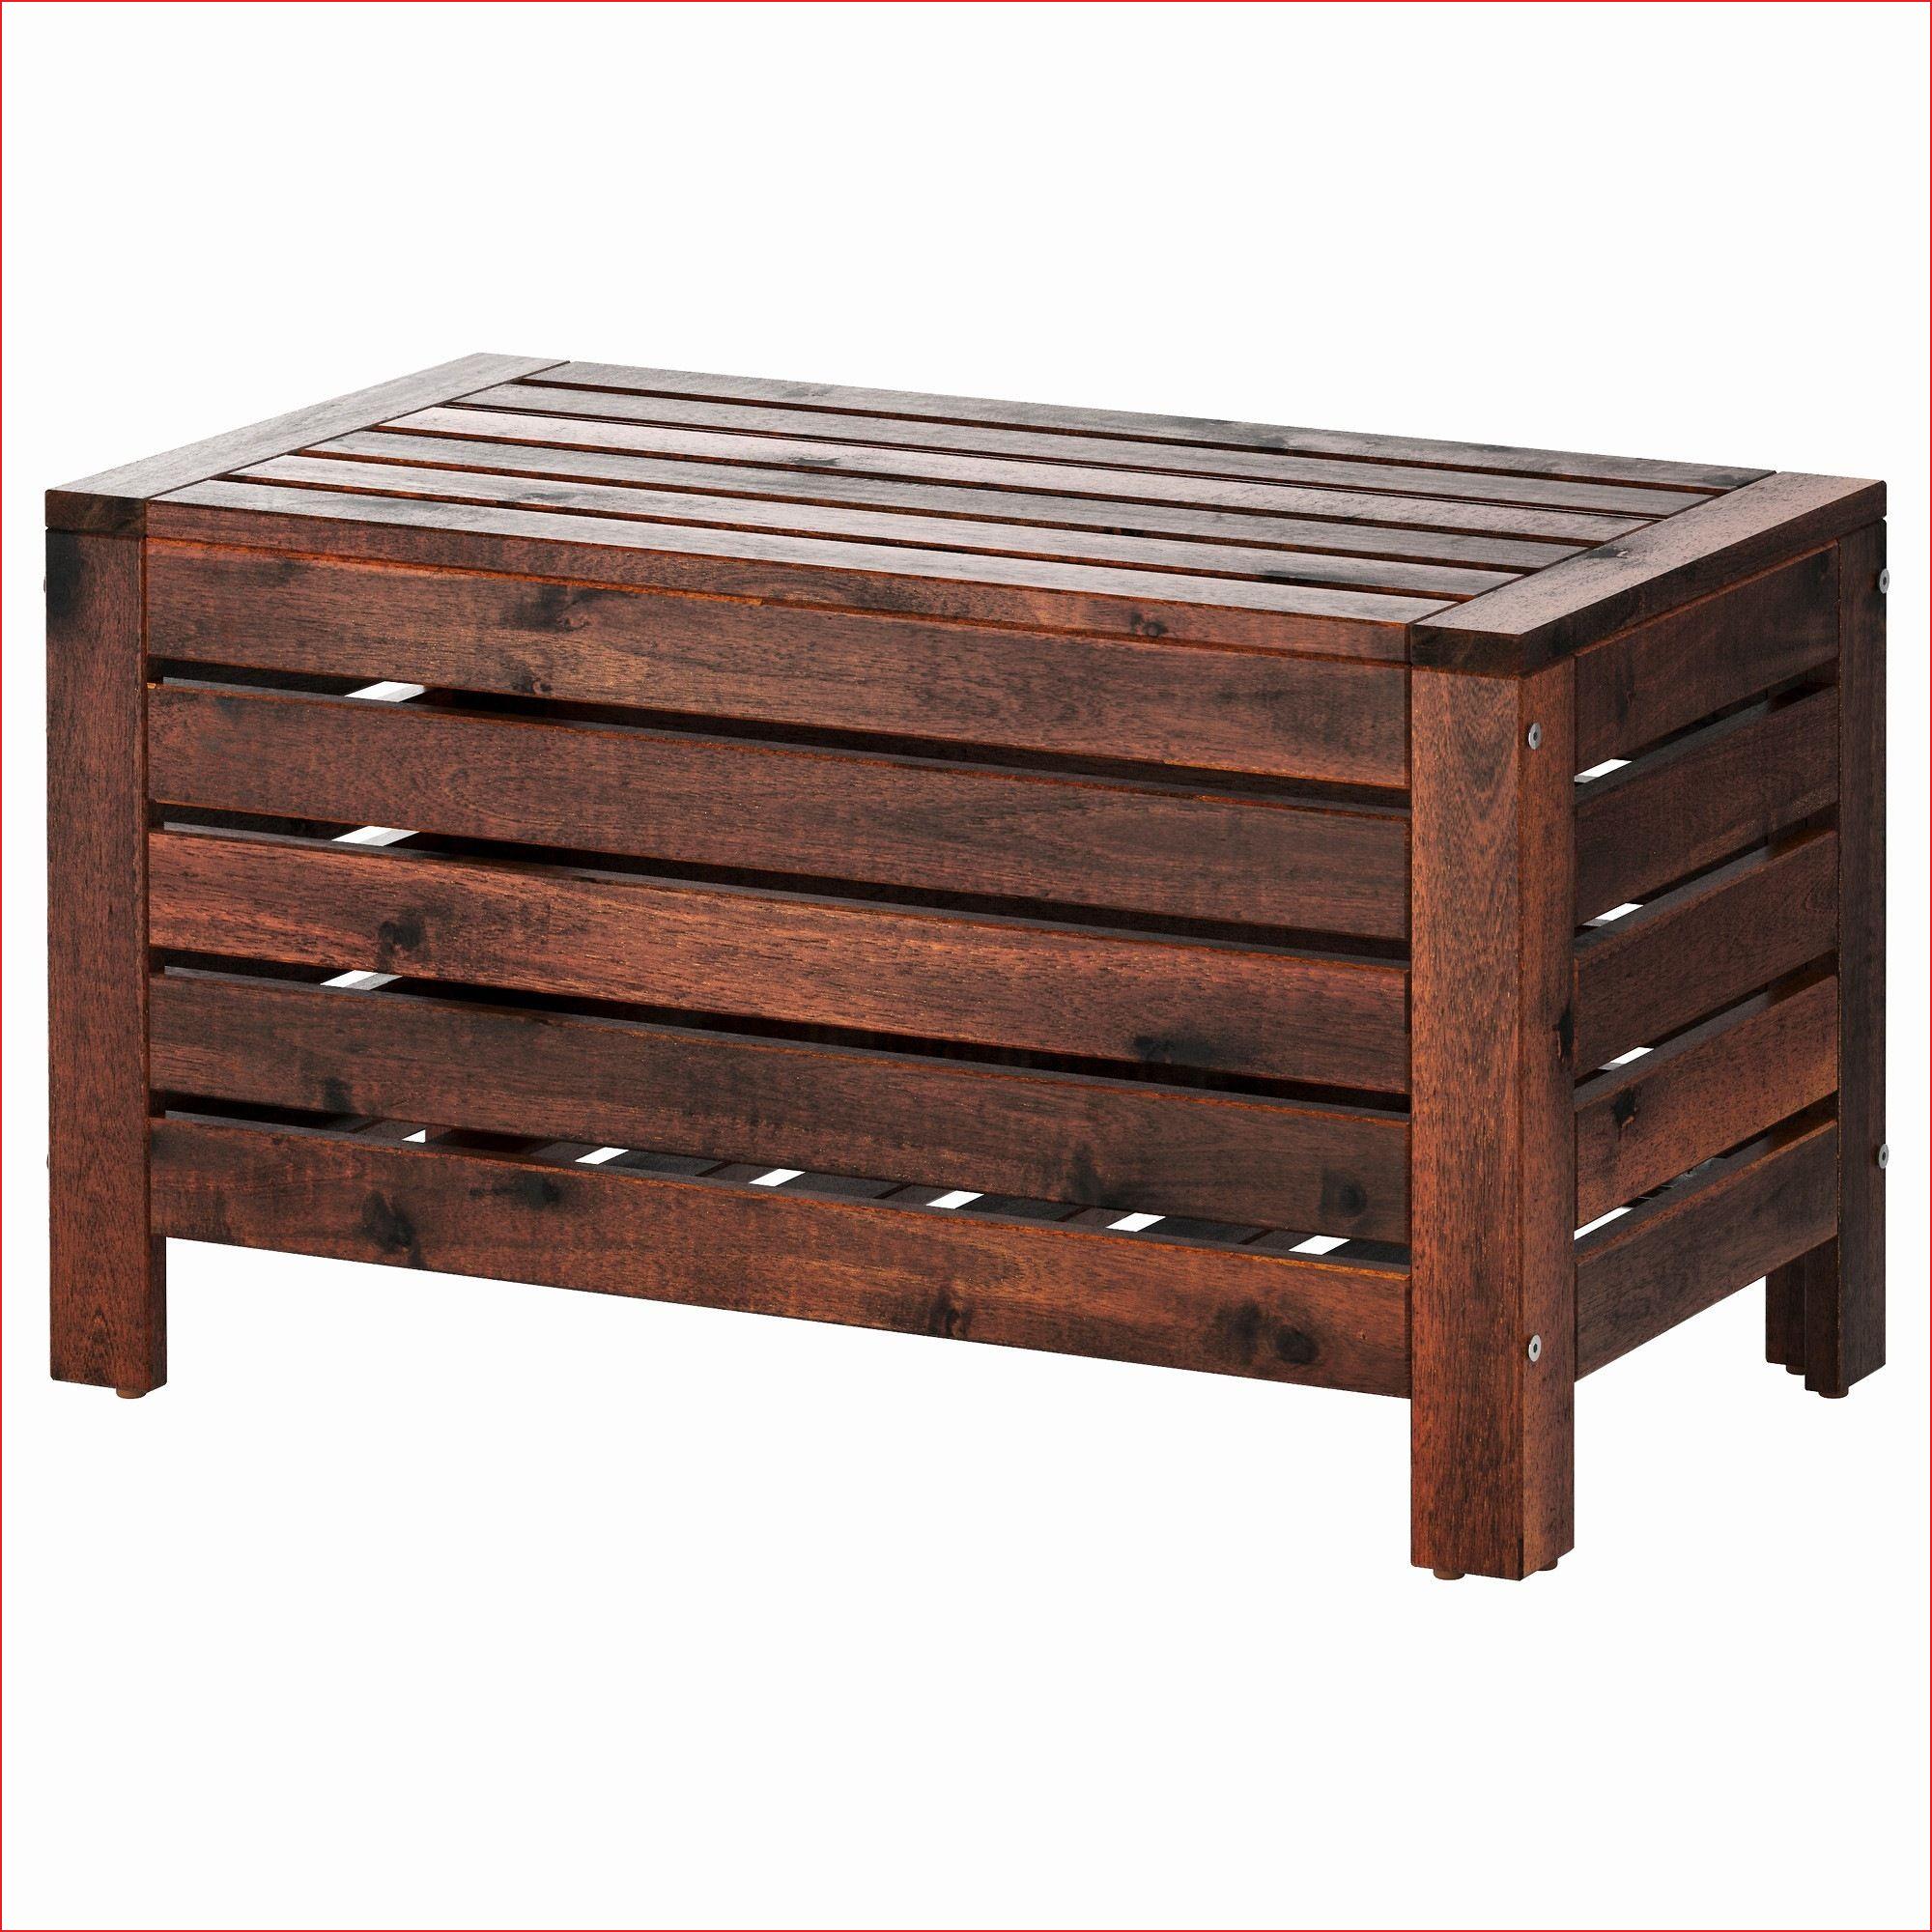 Prendre Un Coffre De Jardin Ikea Collection De Jardin Idée ... dedans Coffre De Jardin Ikea